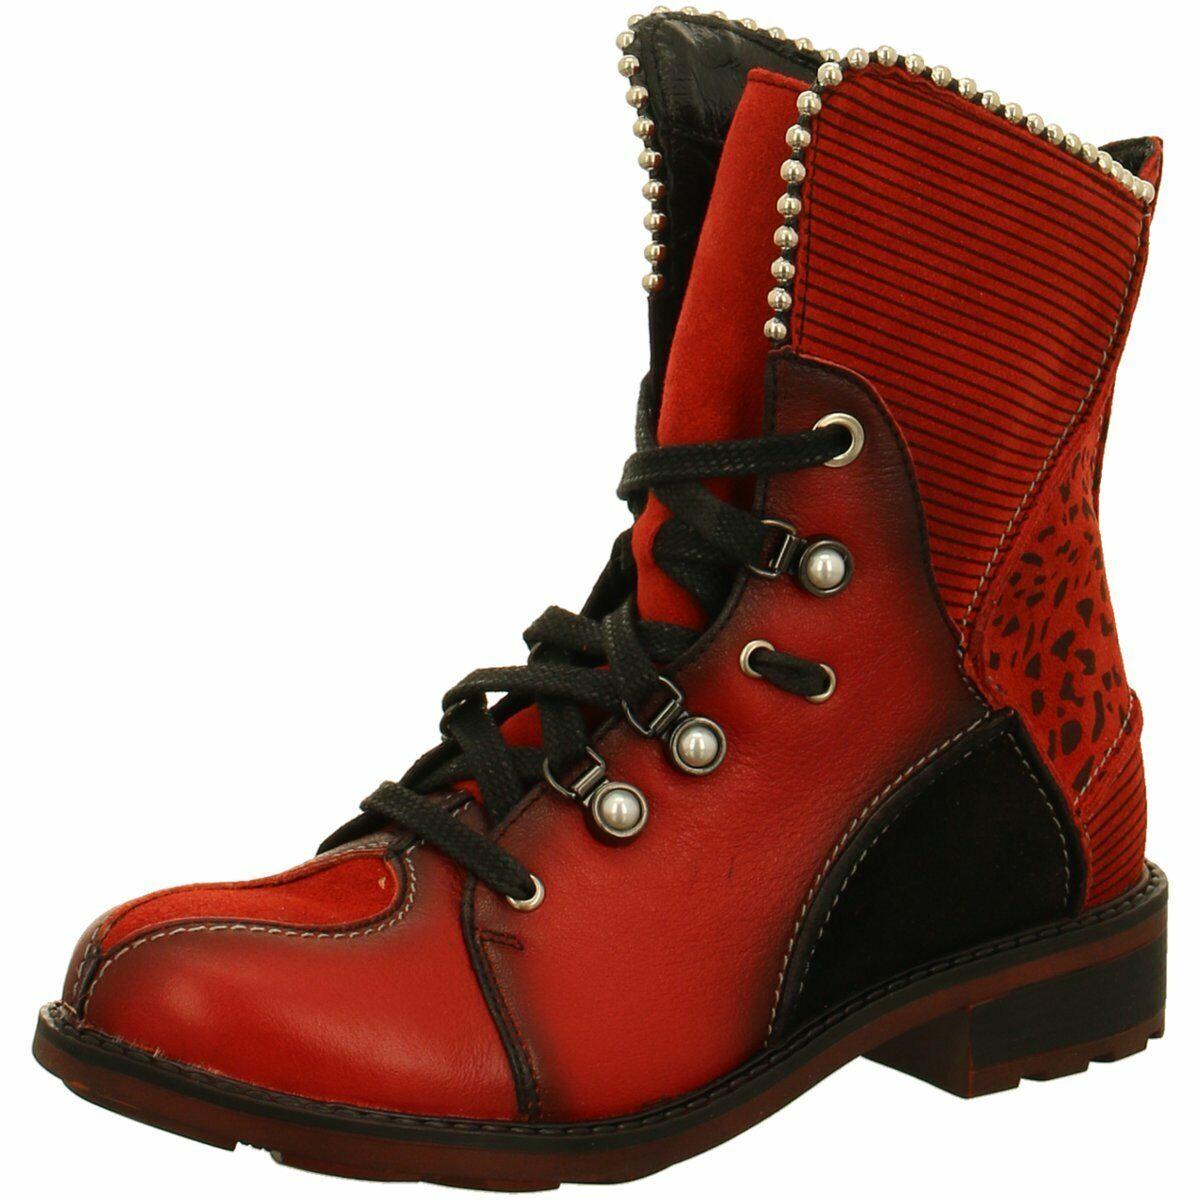 Maciejka Damen Stiefeletten Stiefel in Rot-Schwarz 03623-08 00-3 rot 738309